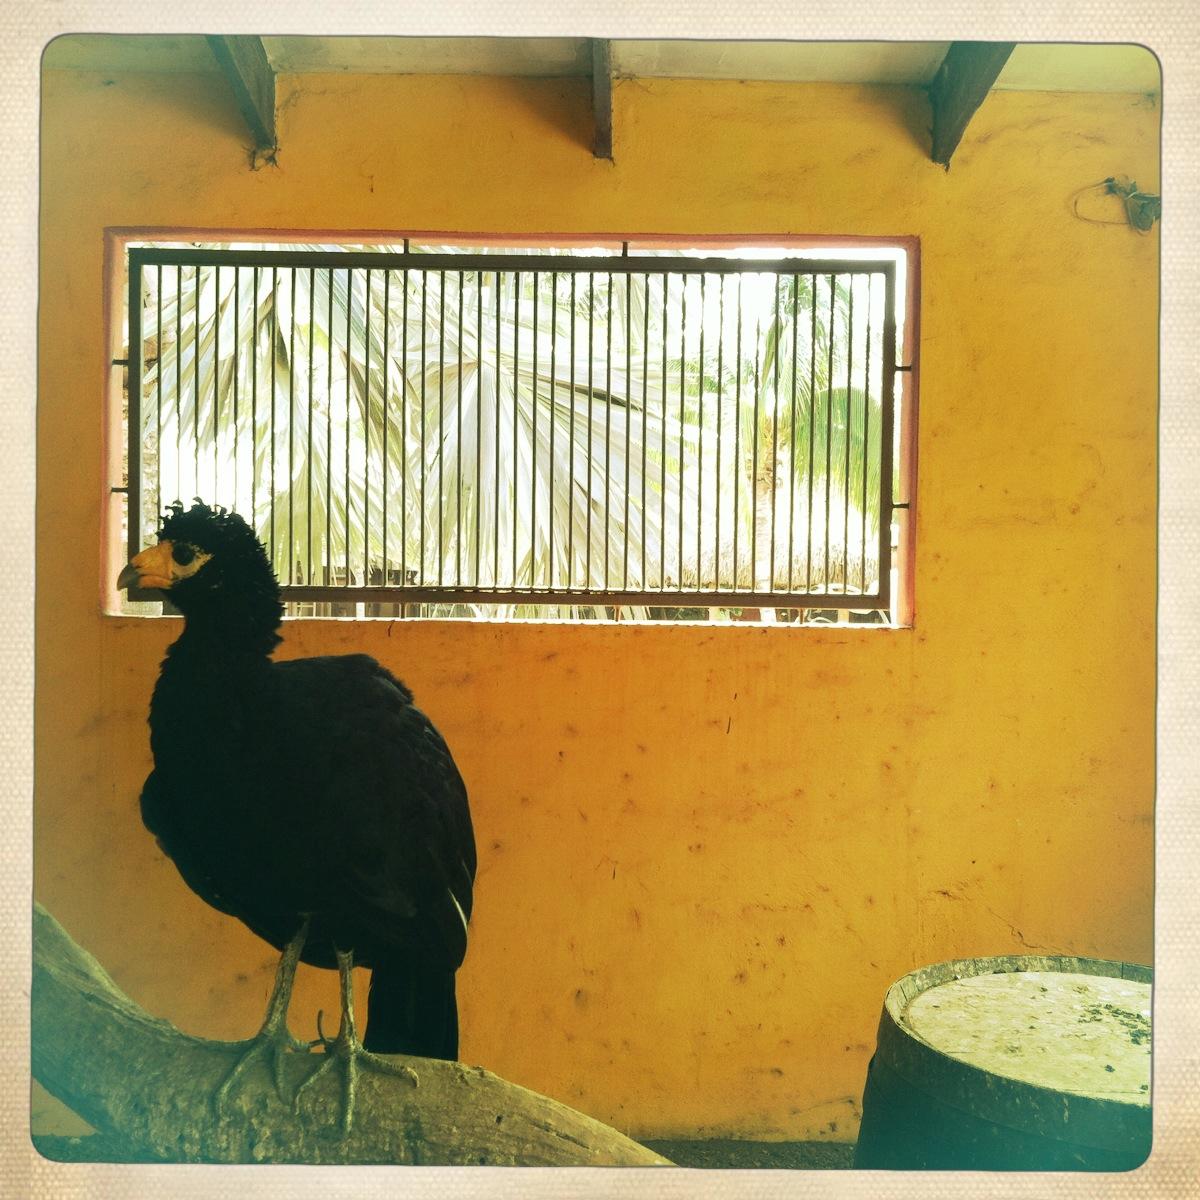 photo of exotic bird in enclosure at animal garden